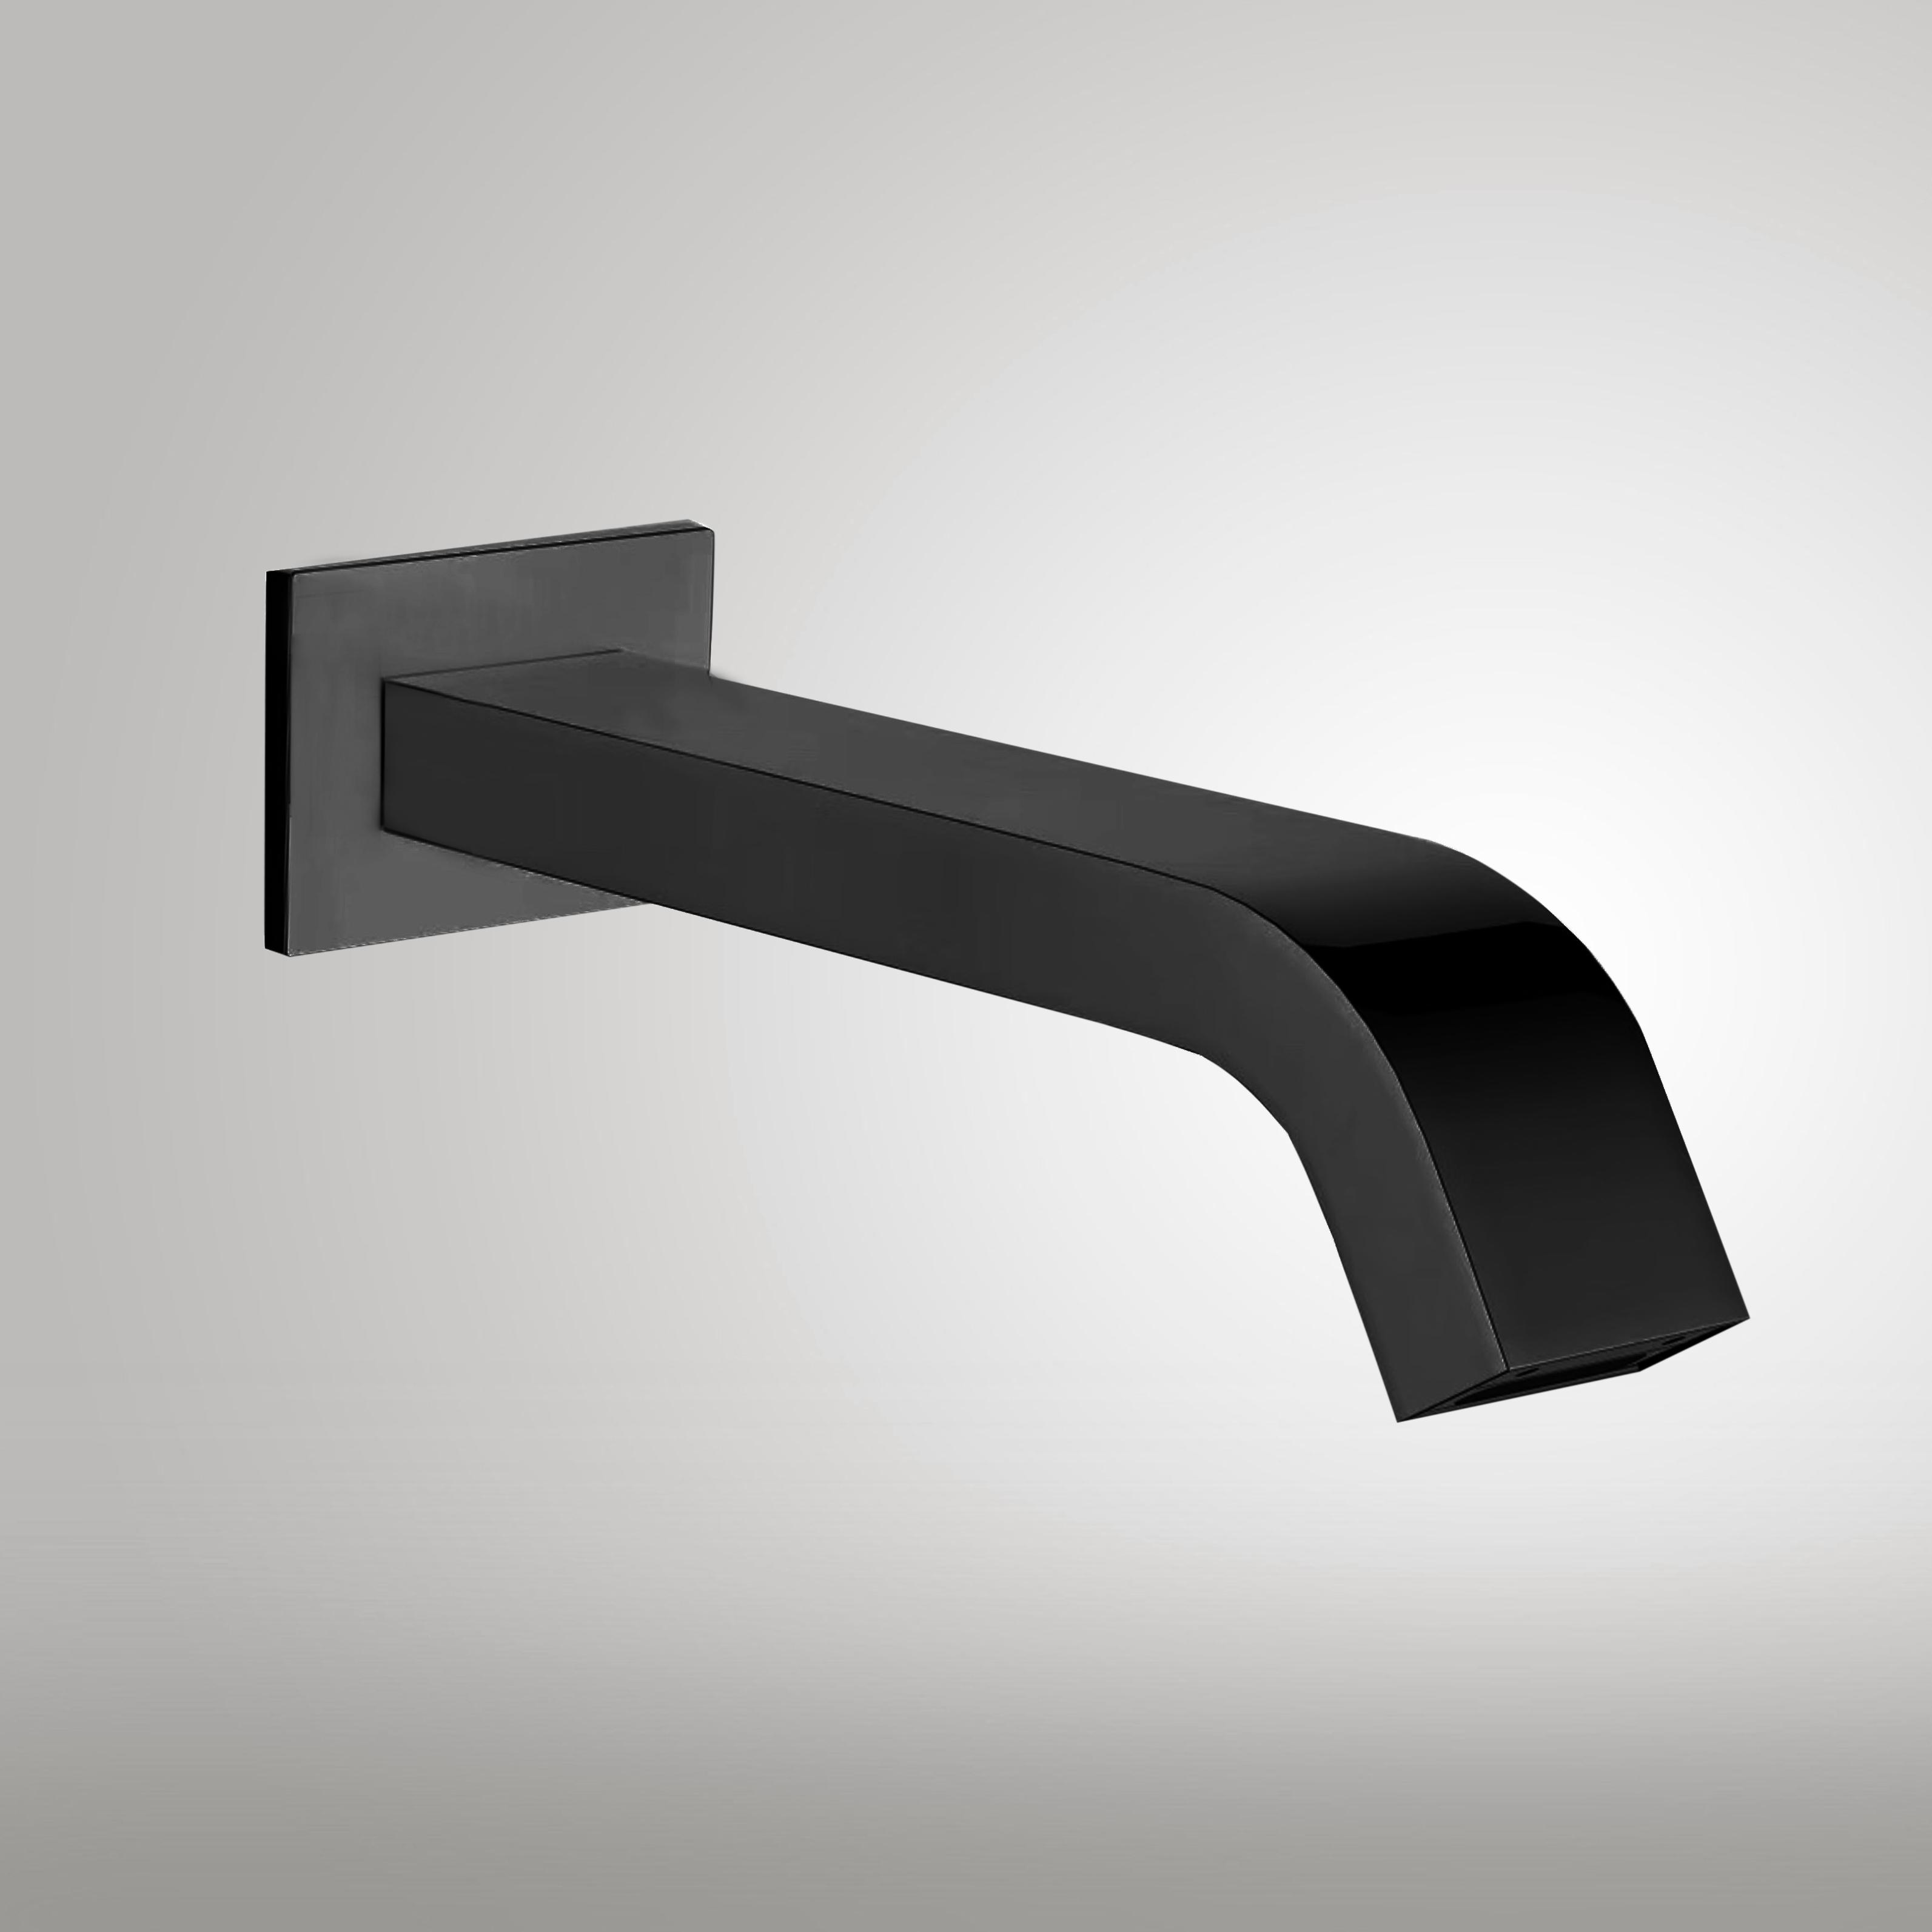 fontana commercial automatic wall mount dark oil rubbed bronze sensor bathroom faucet